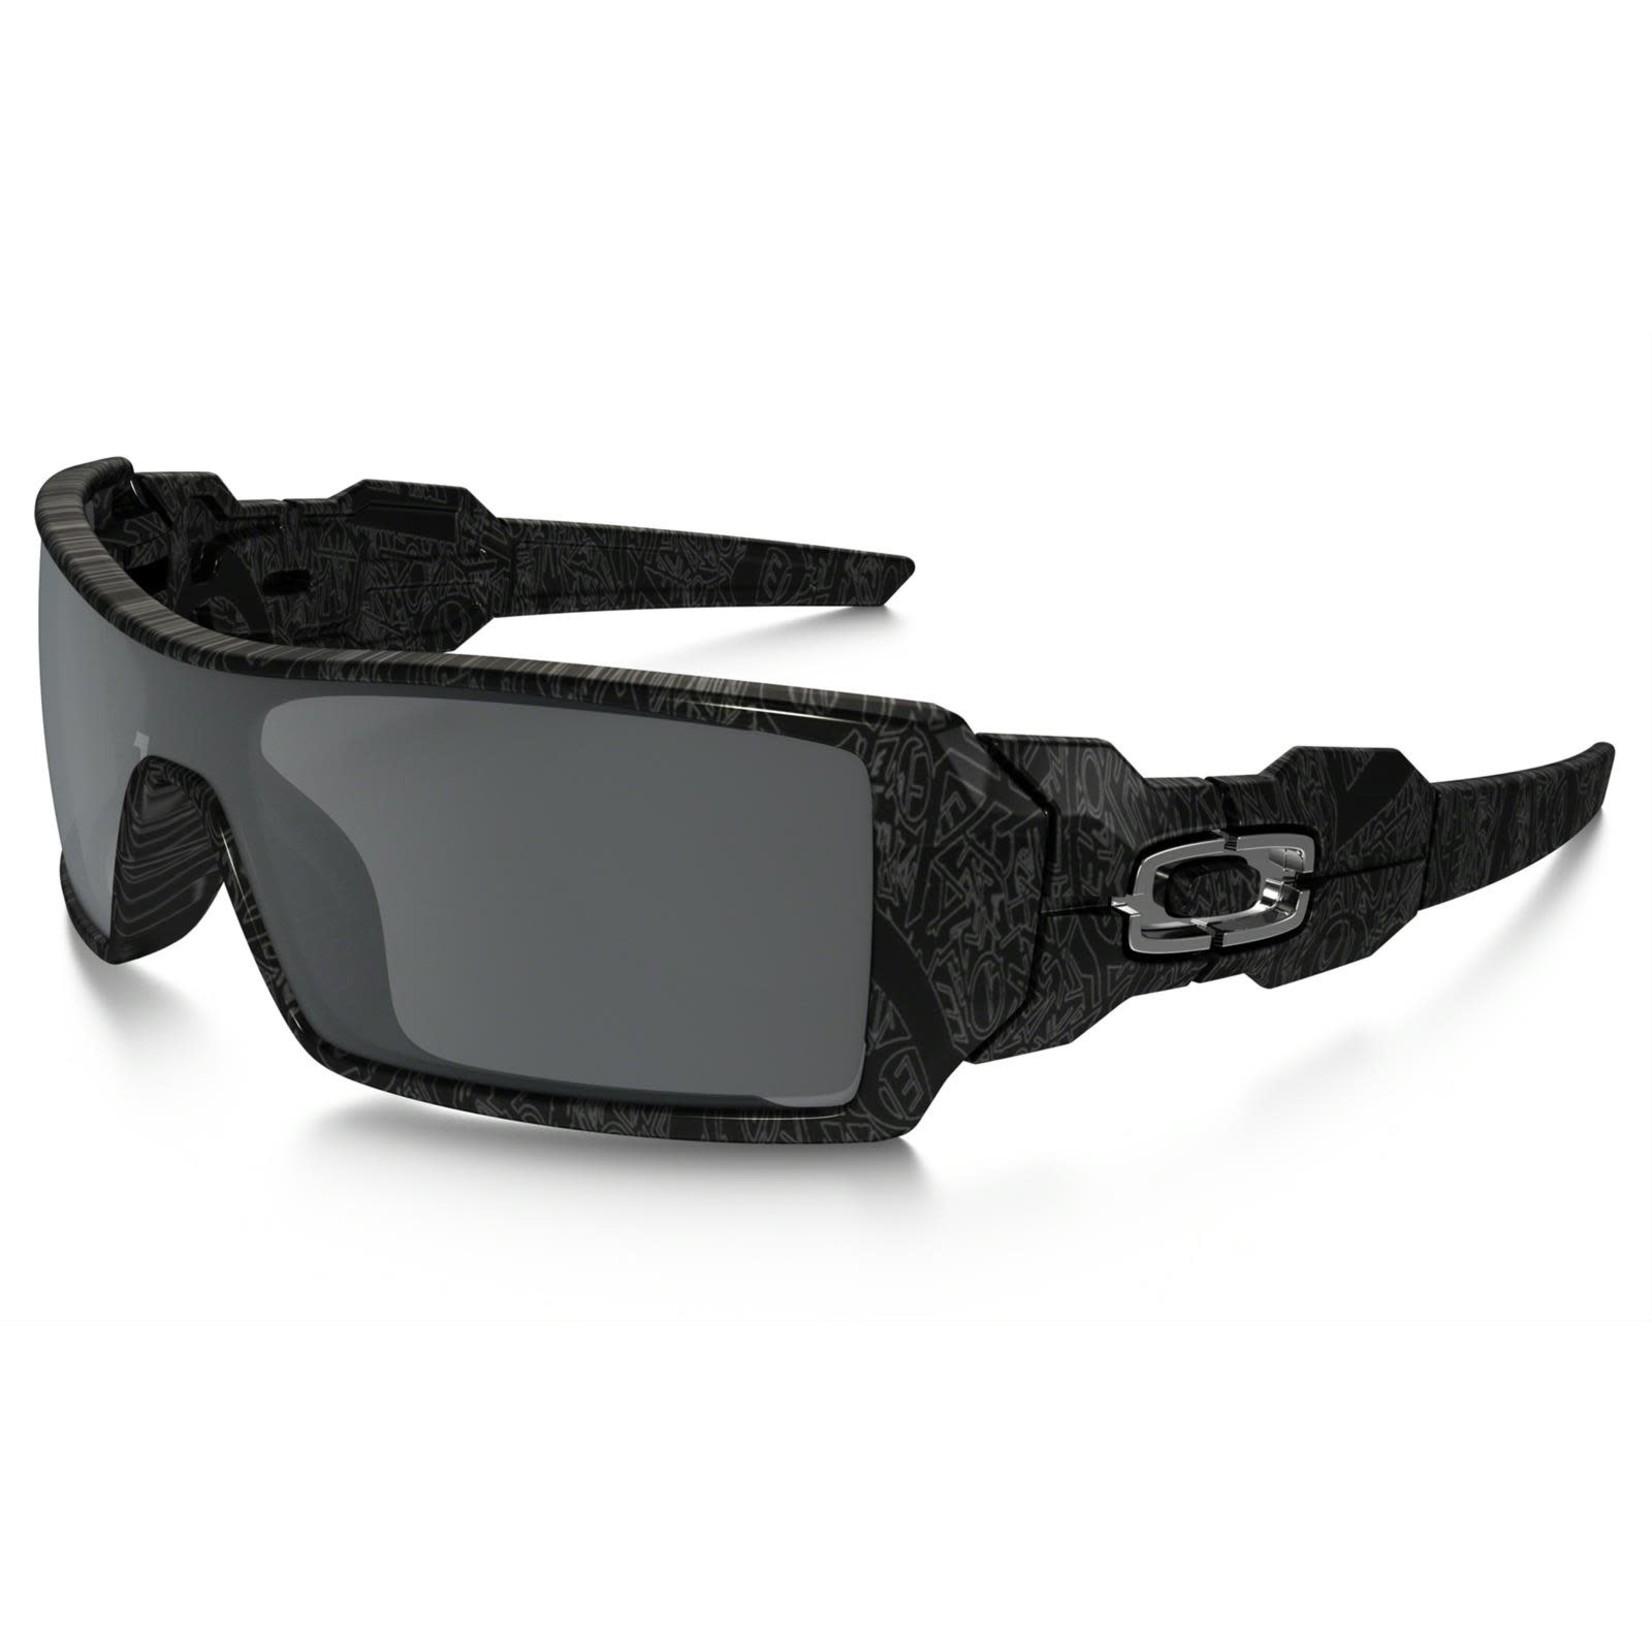 Oakley Oakley Sunglasses, Oil Rig, Polished Blk w/ Slv Ghost Text, Blk Iridium